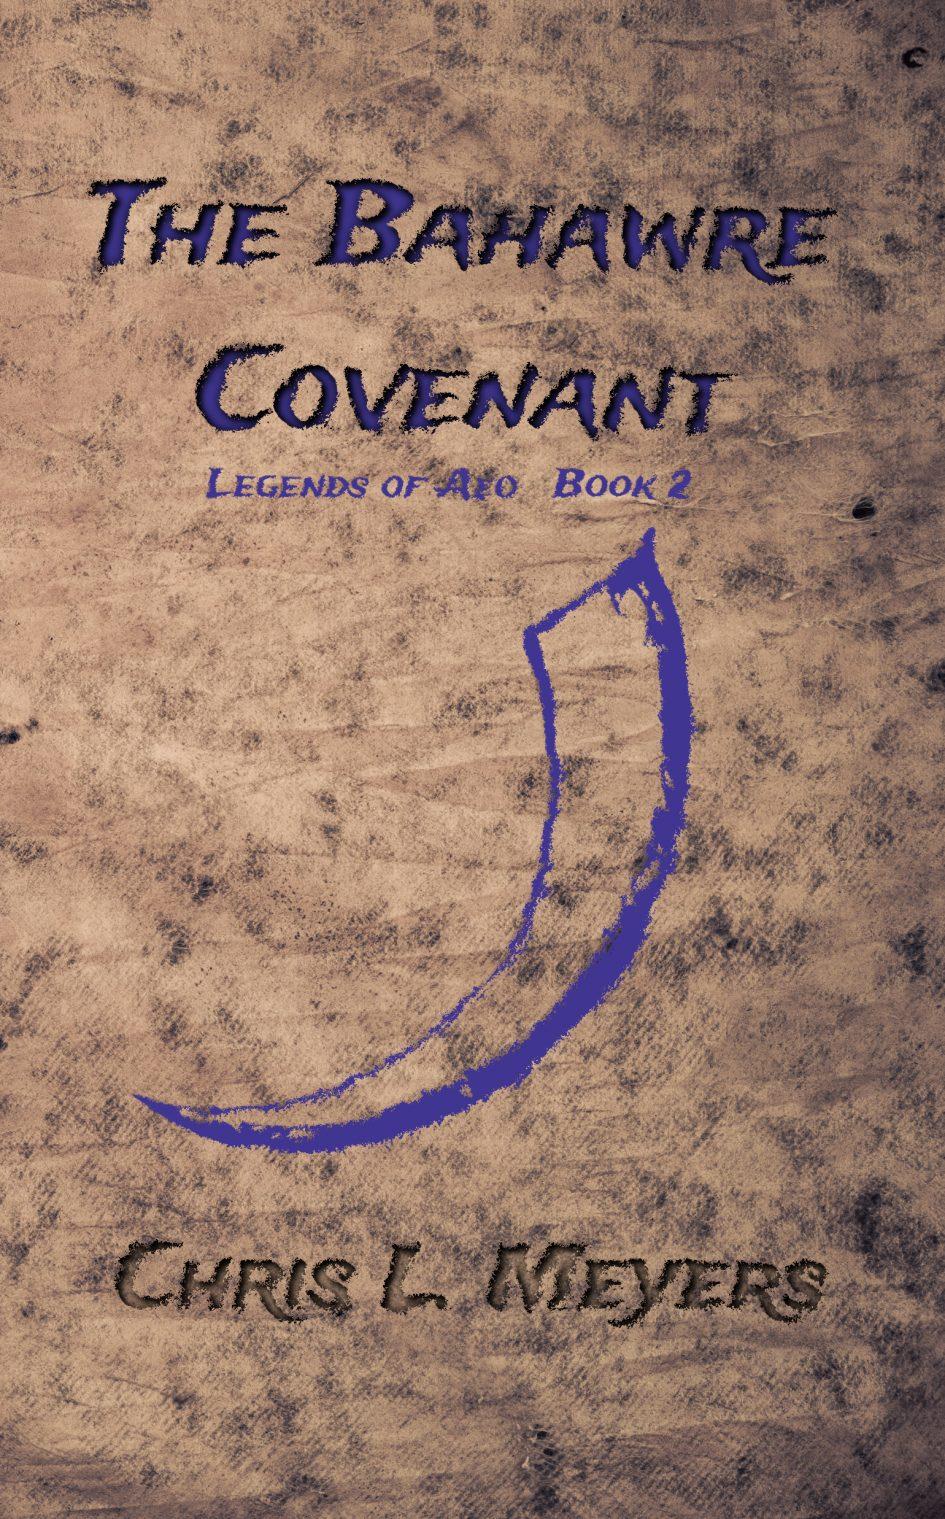 bahawre covenant